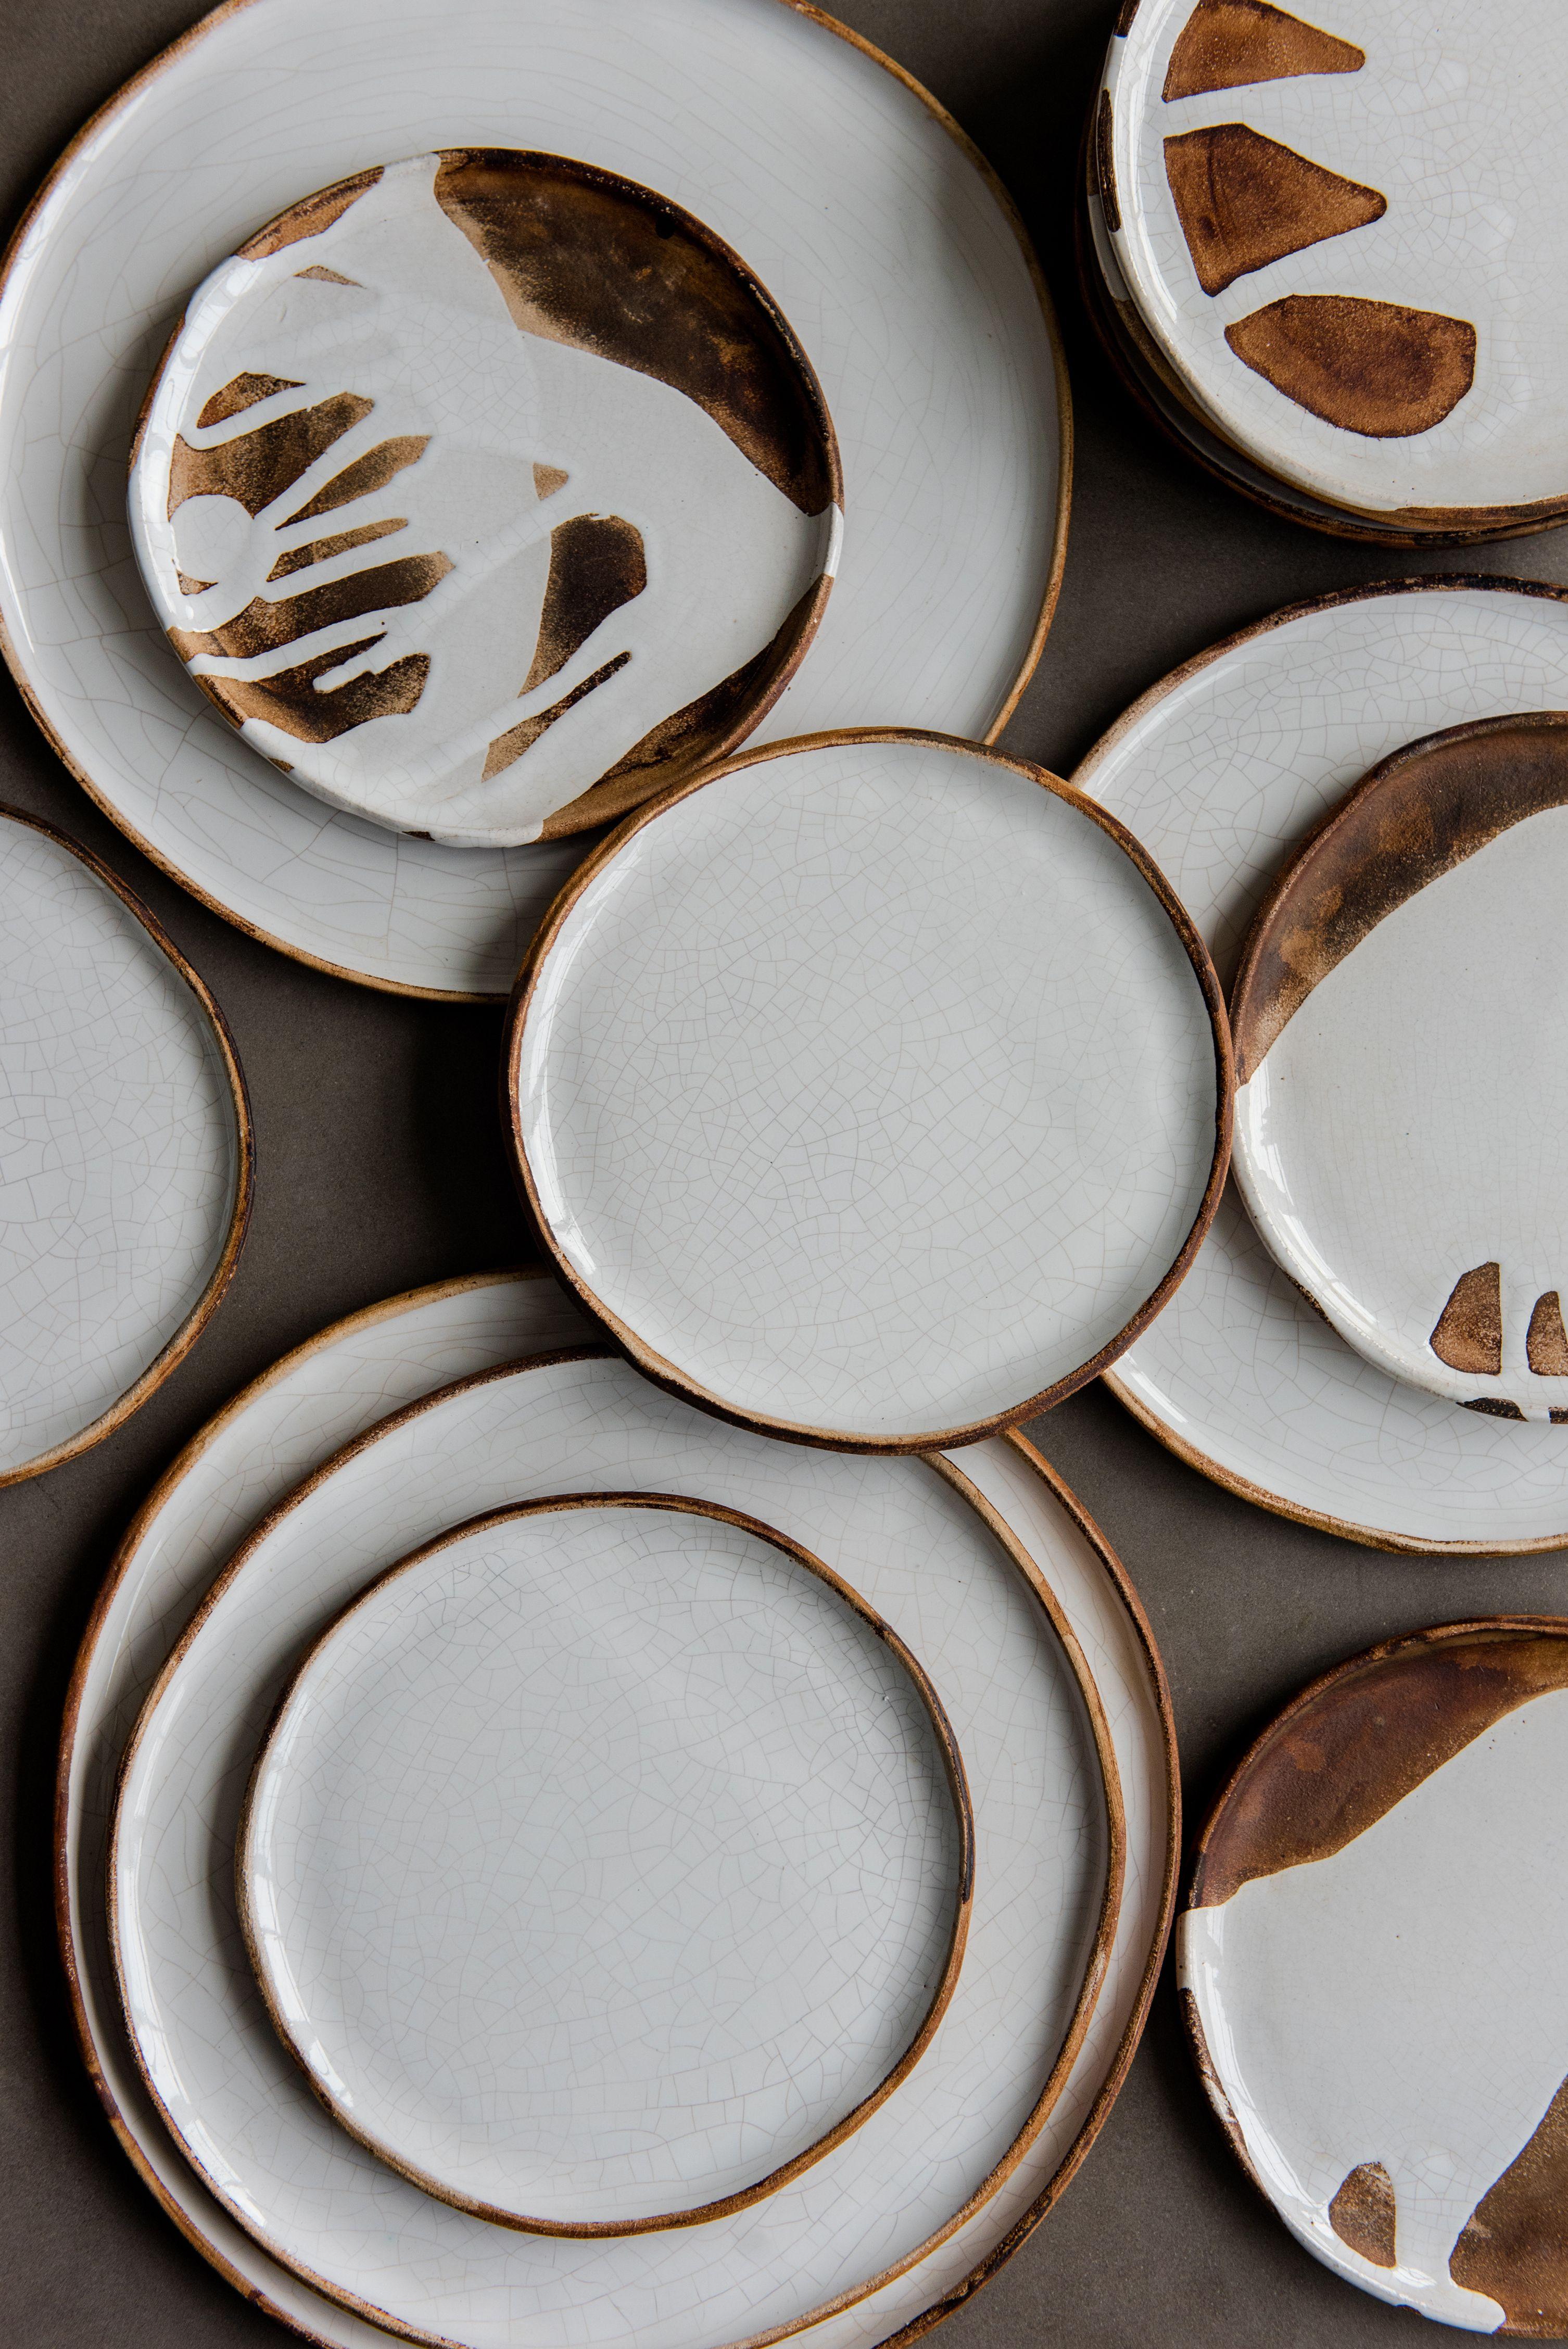 Handmade Stoneware Crackle Plates Stoneware Dinnerware Dinner Etsy Stoneware Dinnerware Ceramic Dinnerware Set Rustic Dinnerware